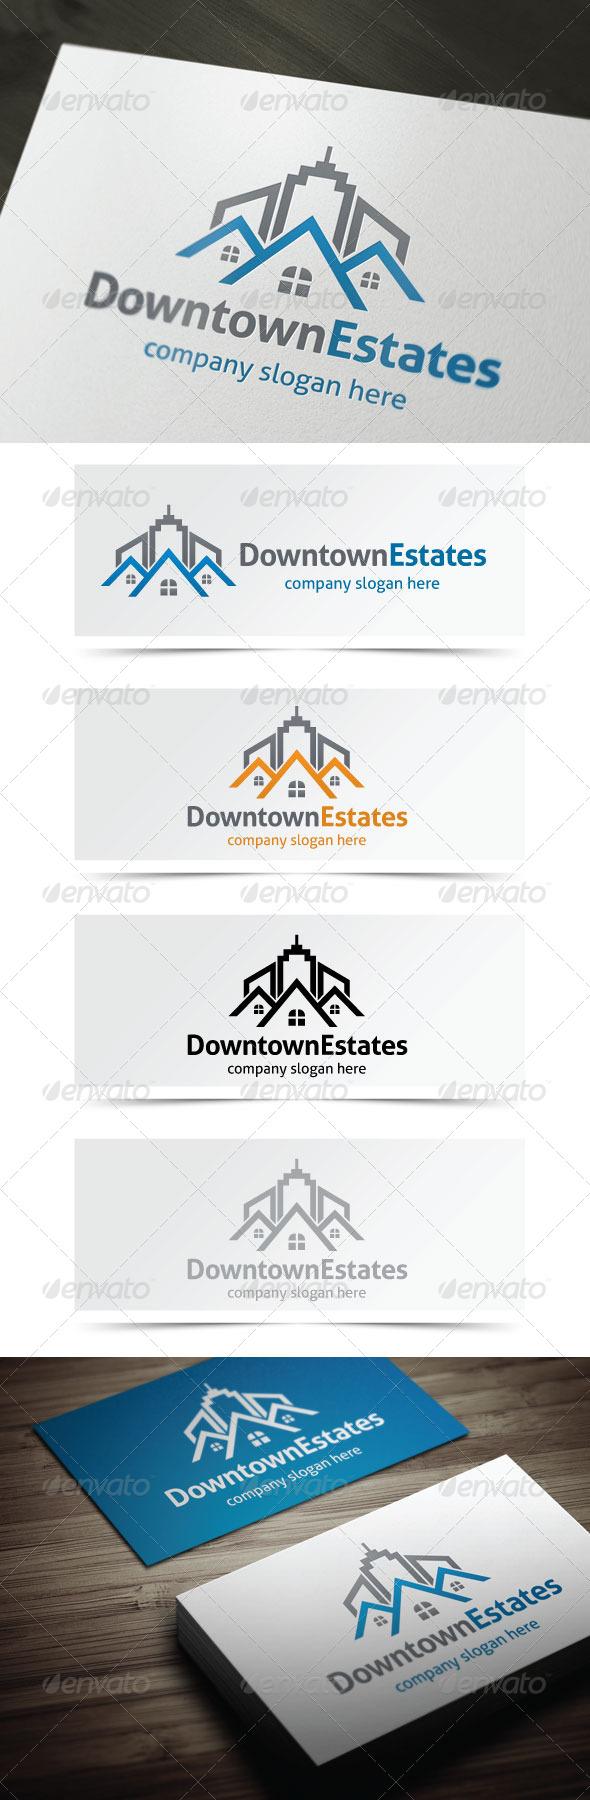 GraphicRiver Downtown Estates 5255315